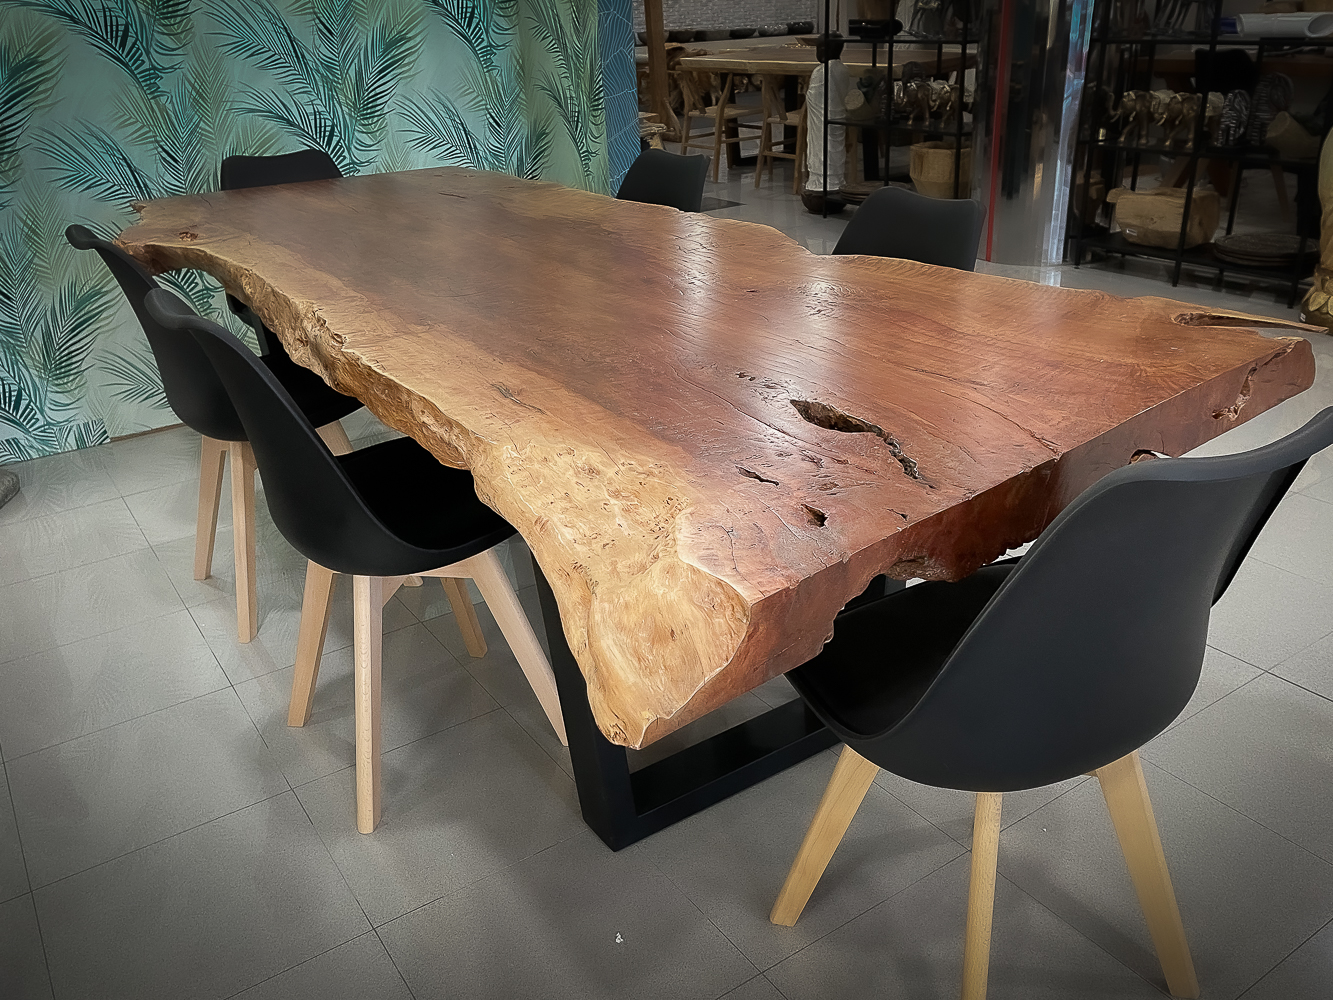 Mesa rústica de madera de Lychee